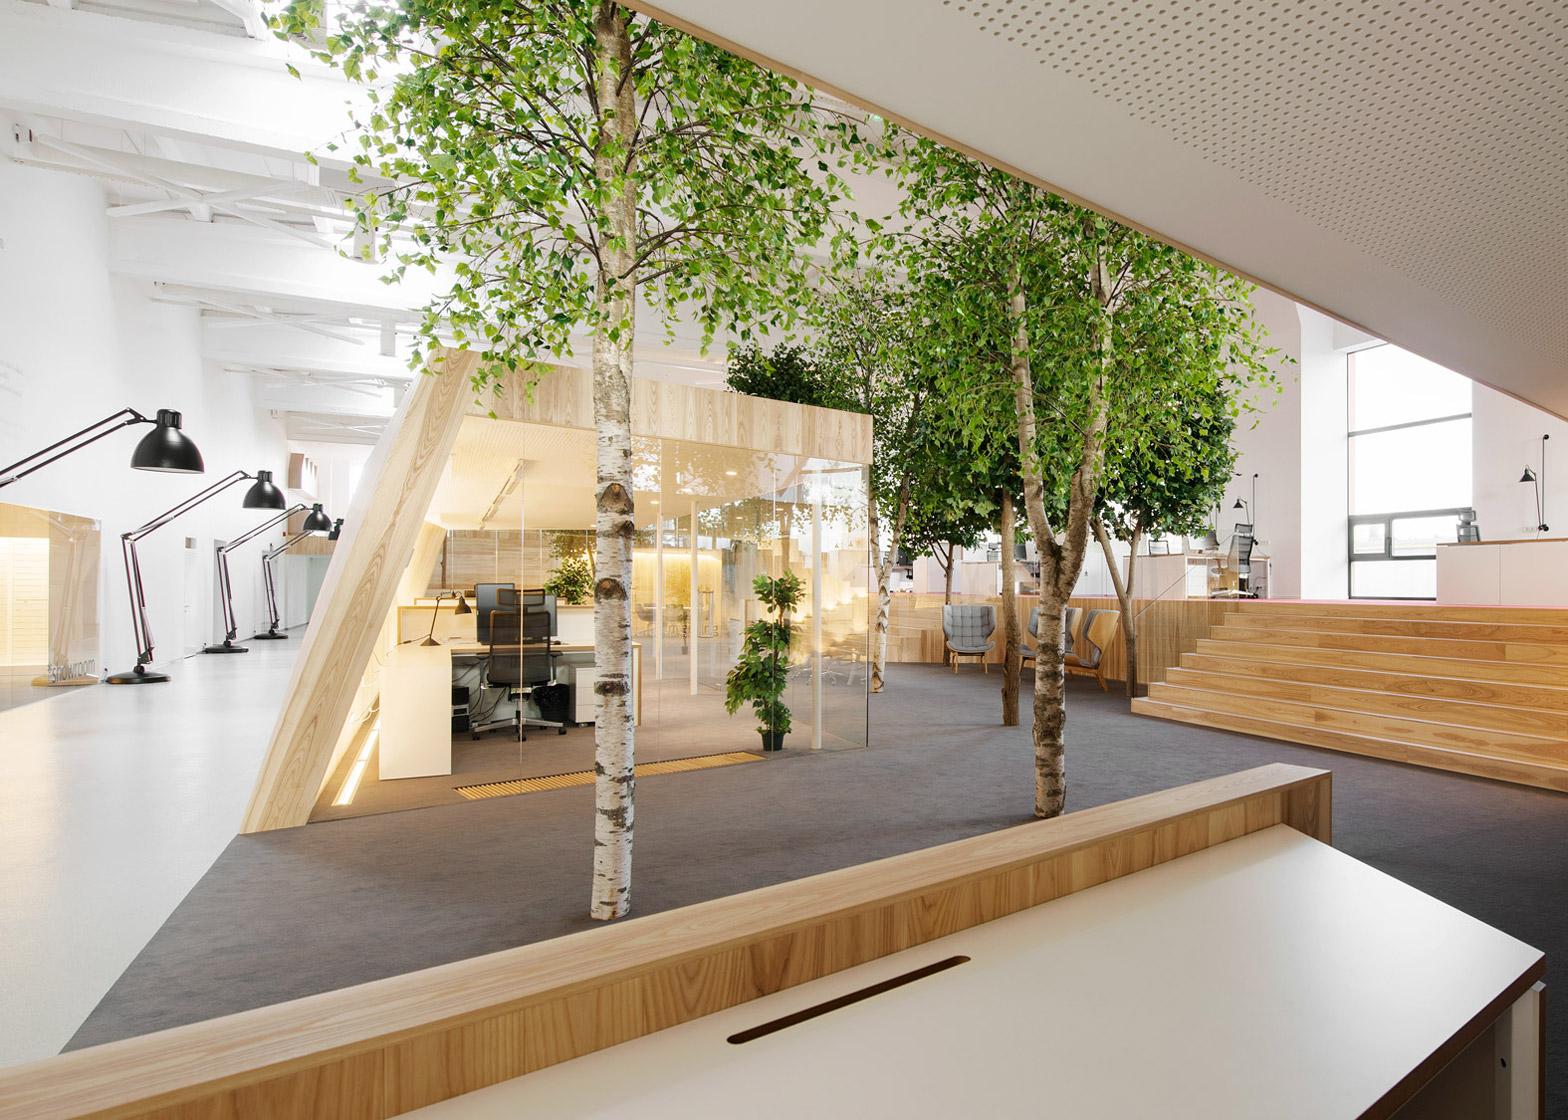 Office-Lenne_Estonia_KAMP-Arhitektid_dezeen_1568_3